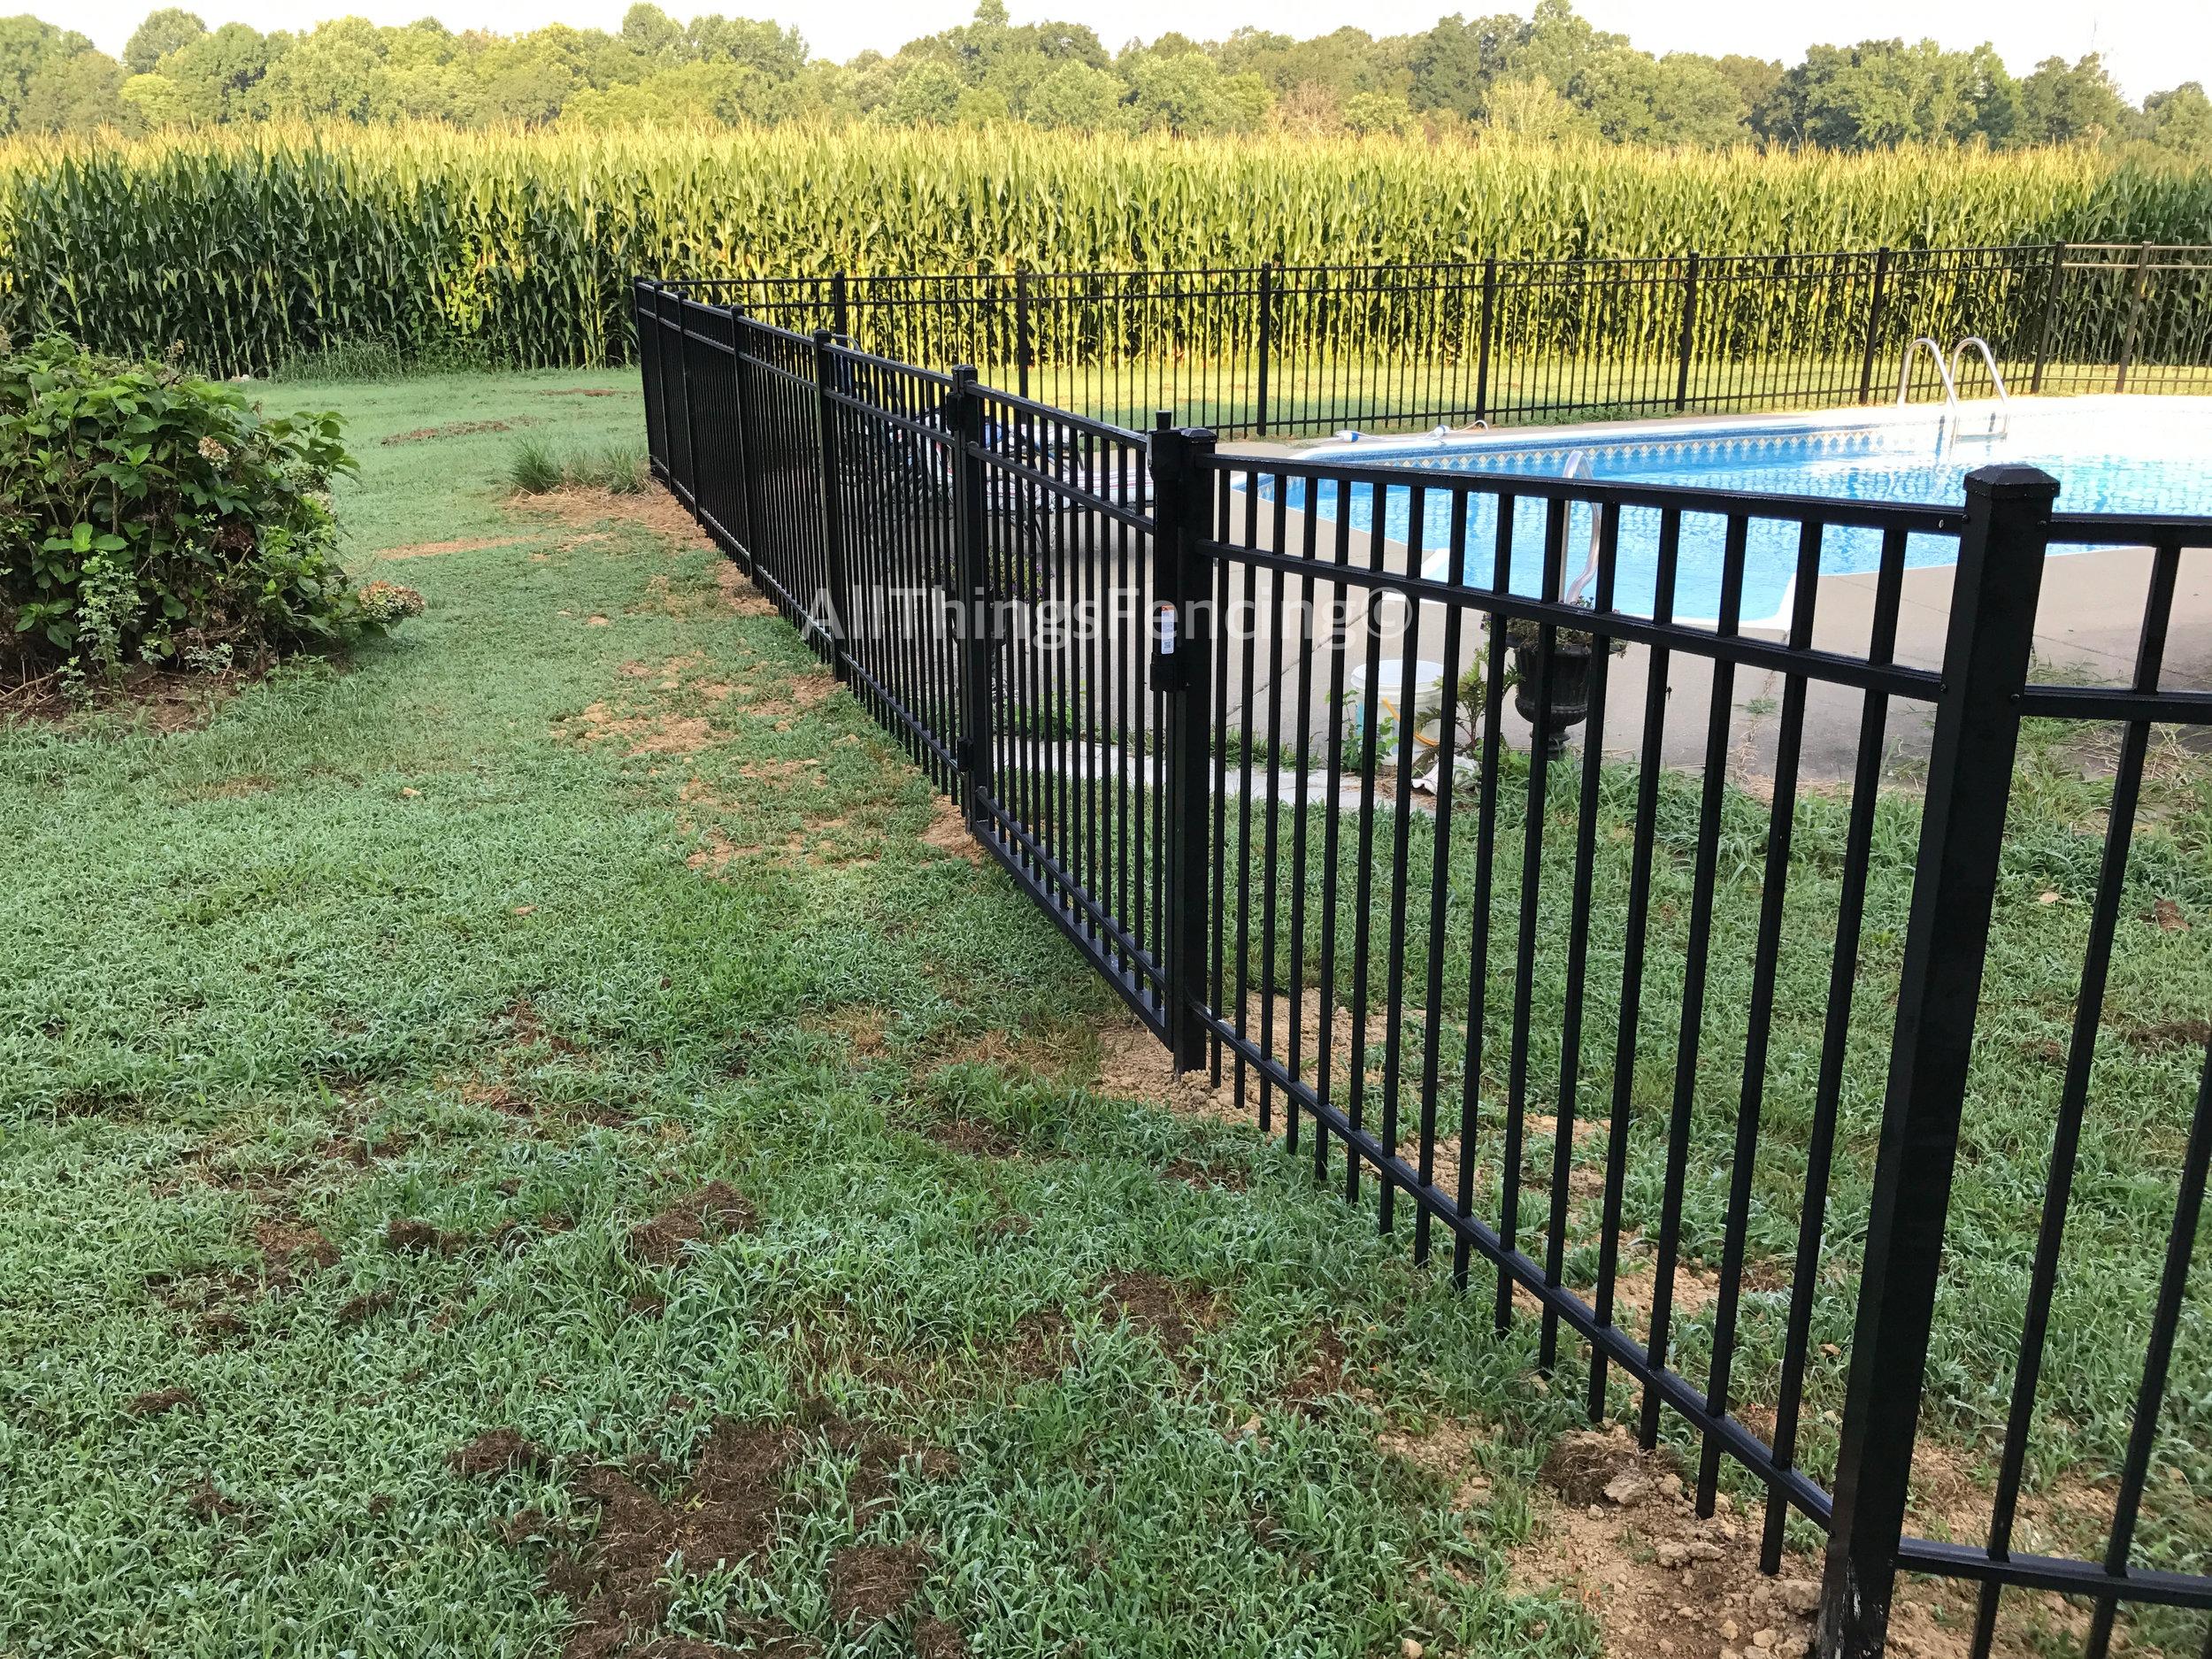 Fence20.jpg